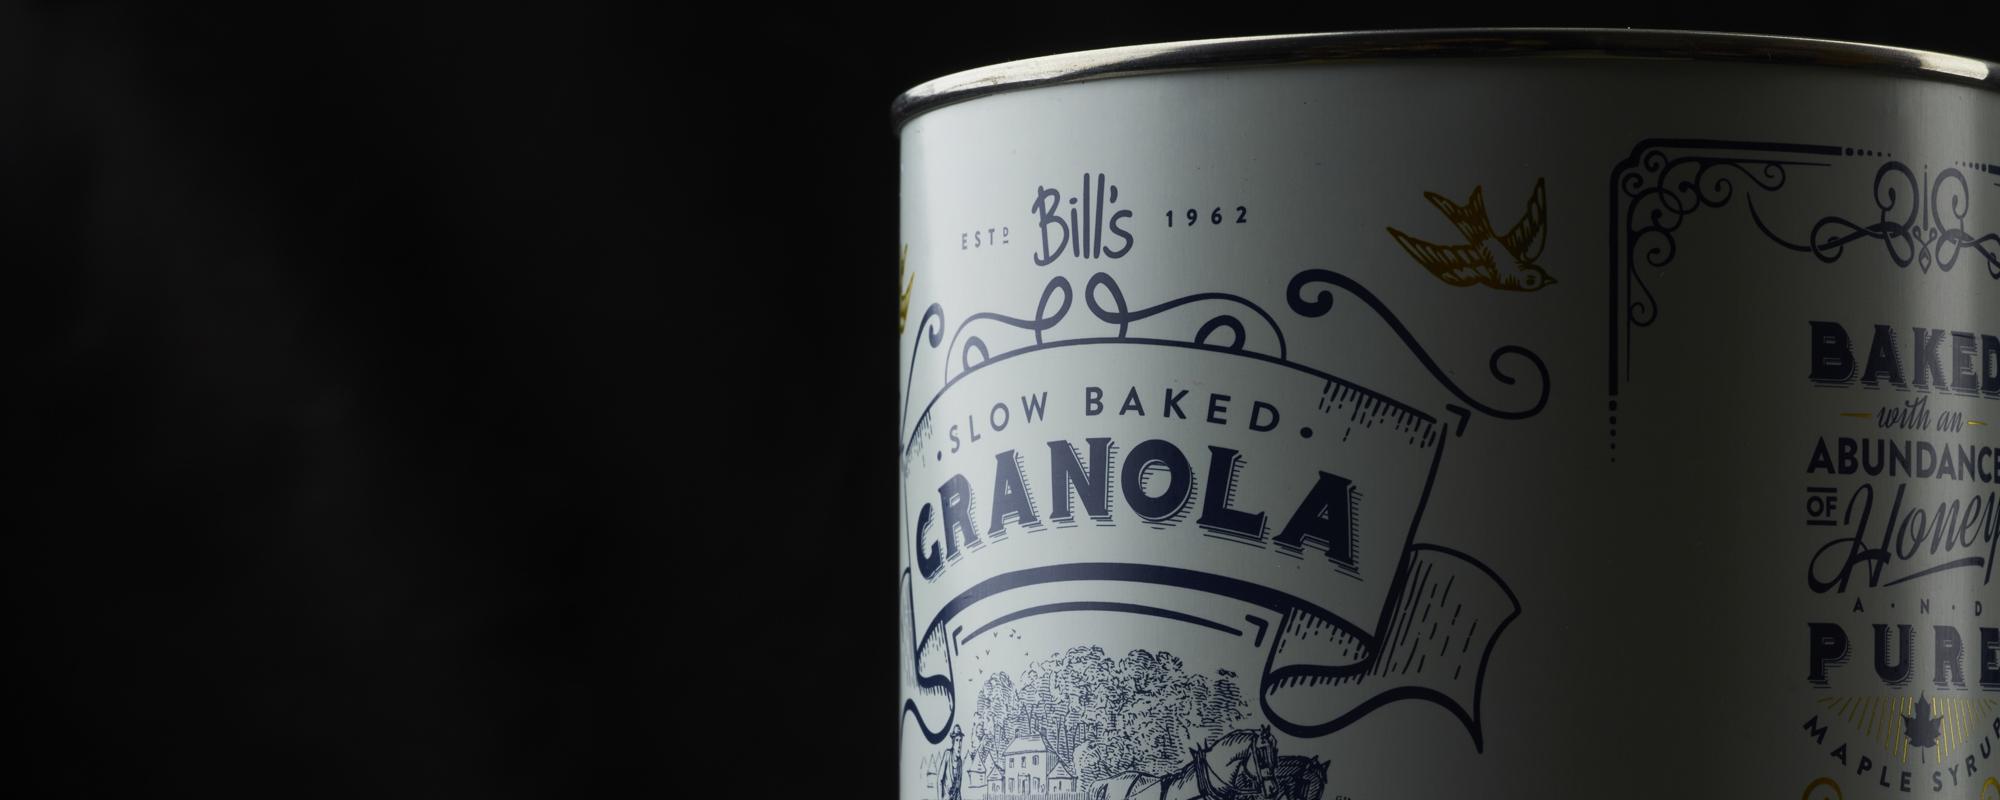 Bills_Granola_Banner.jpg